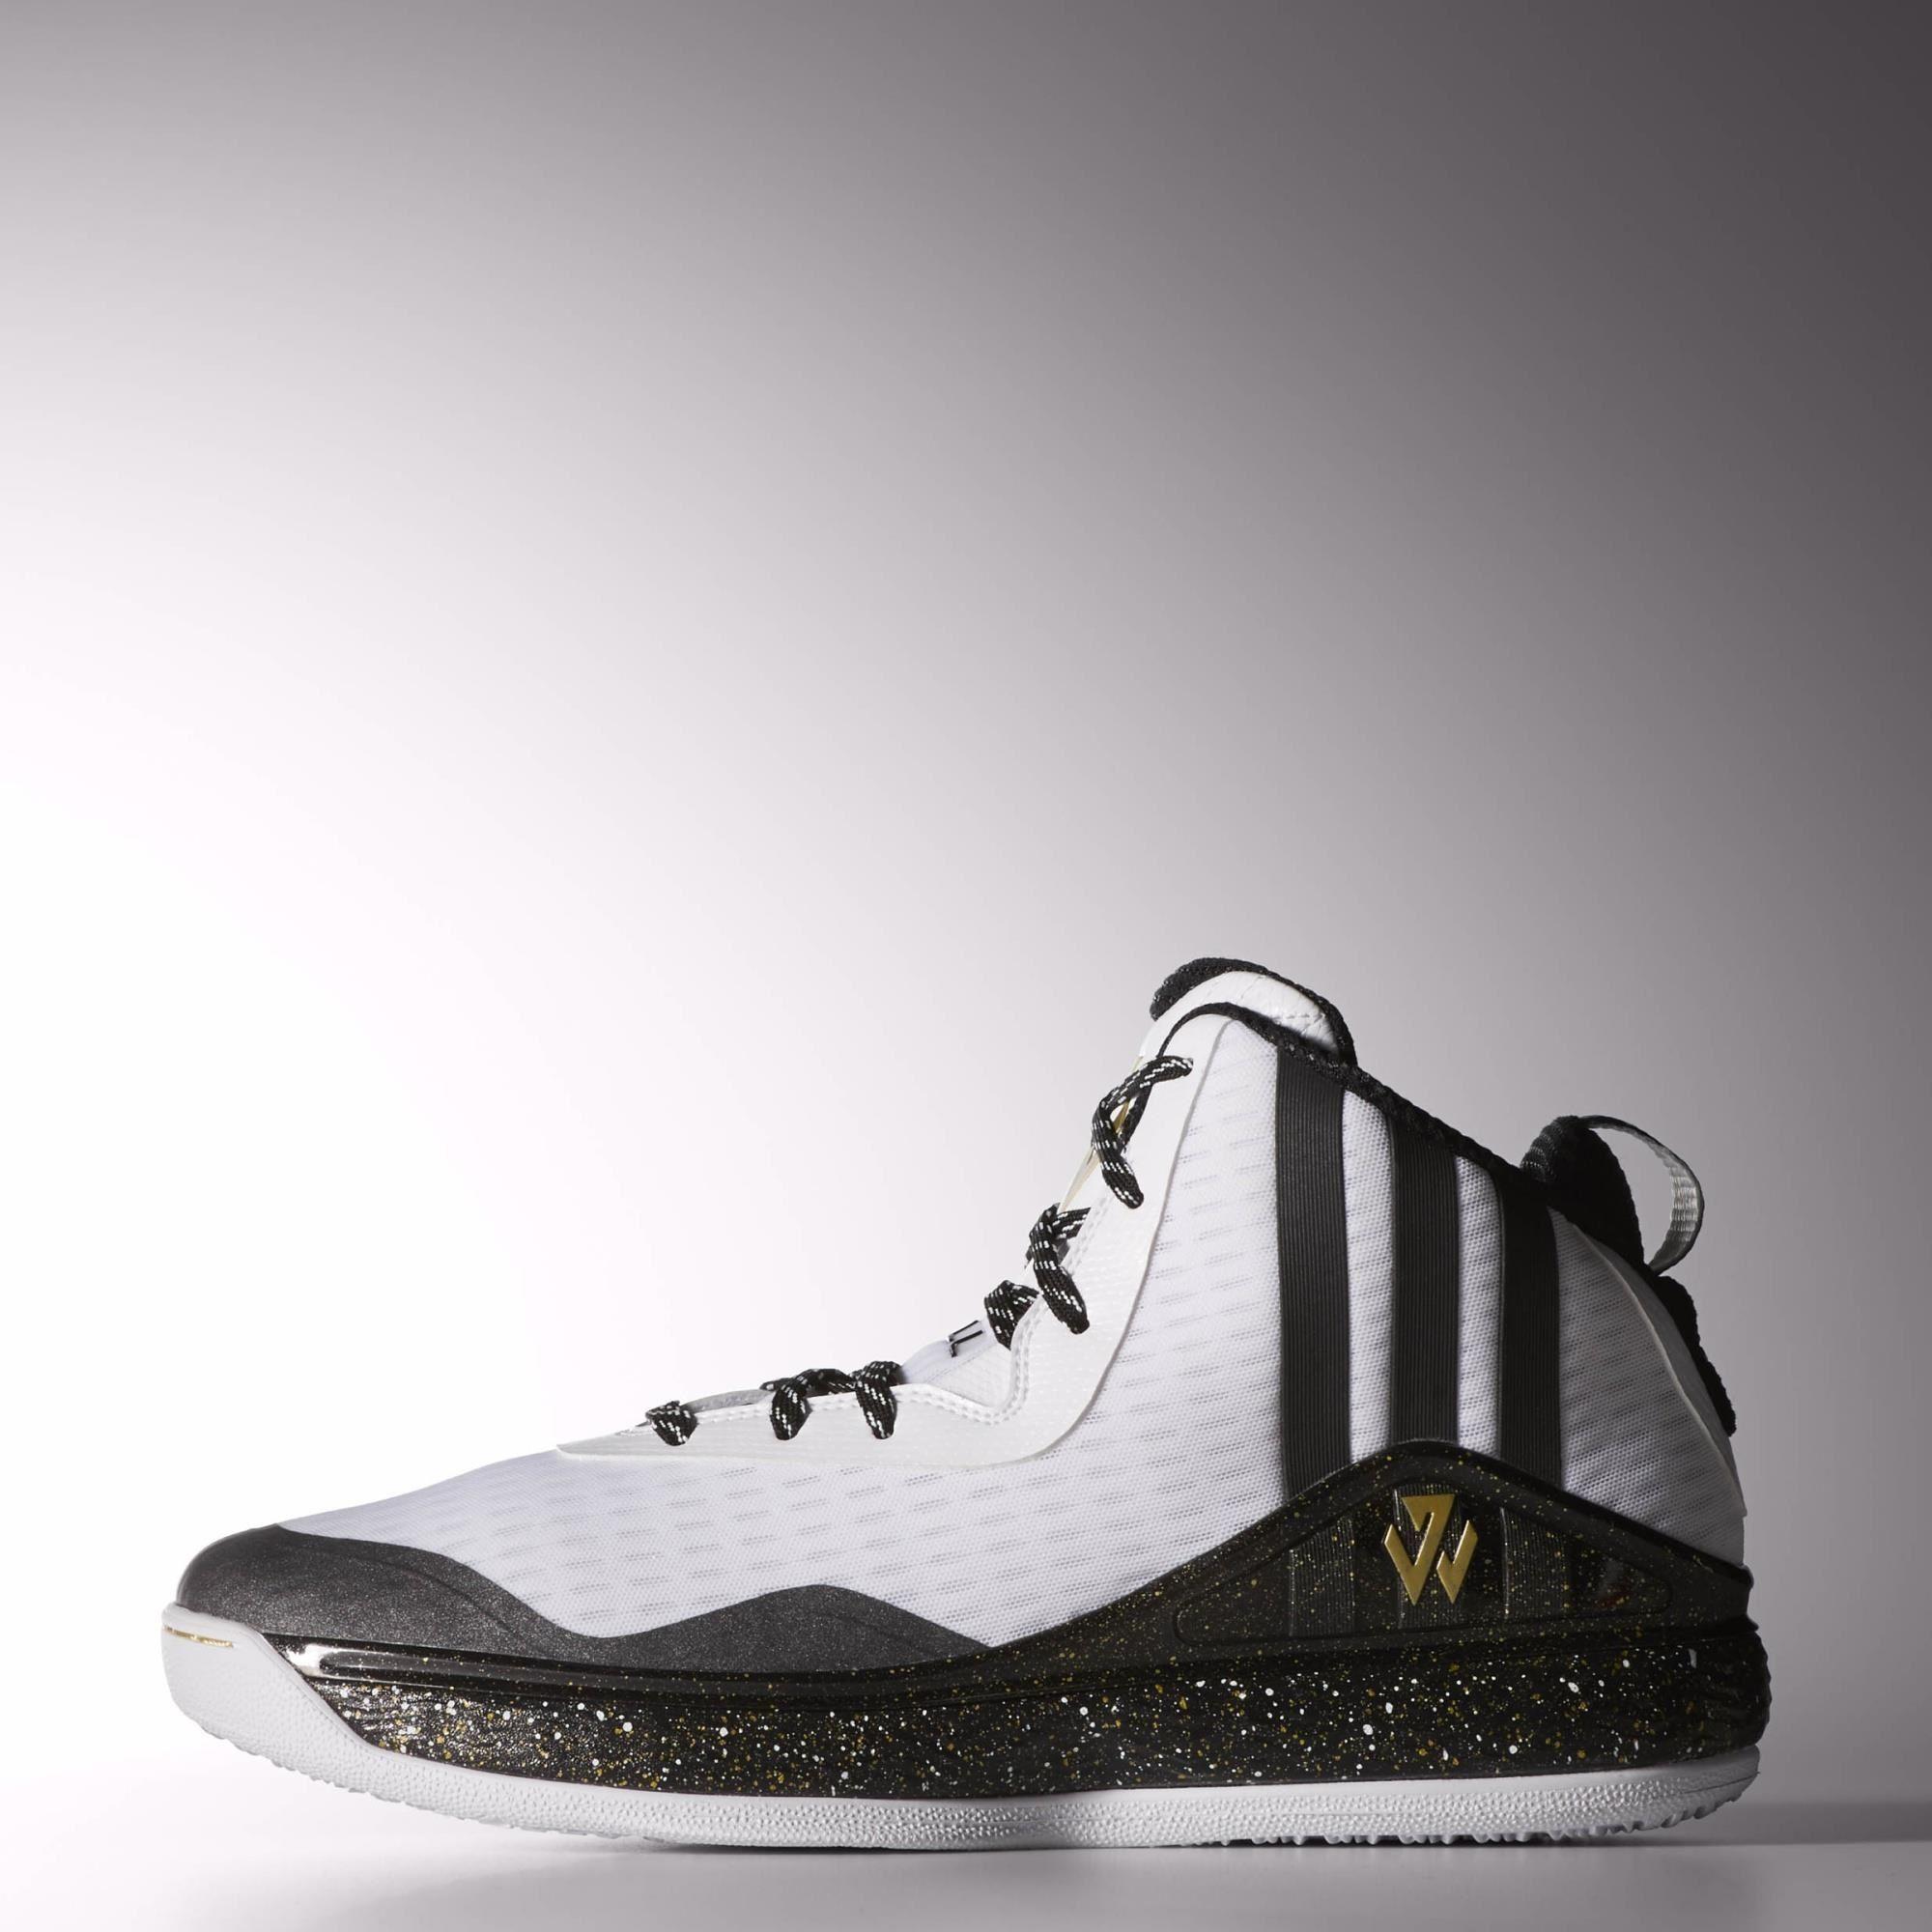 John Wall Shoes Crazyquick